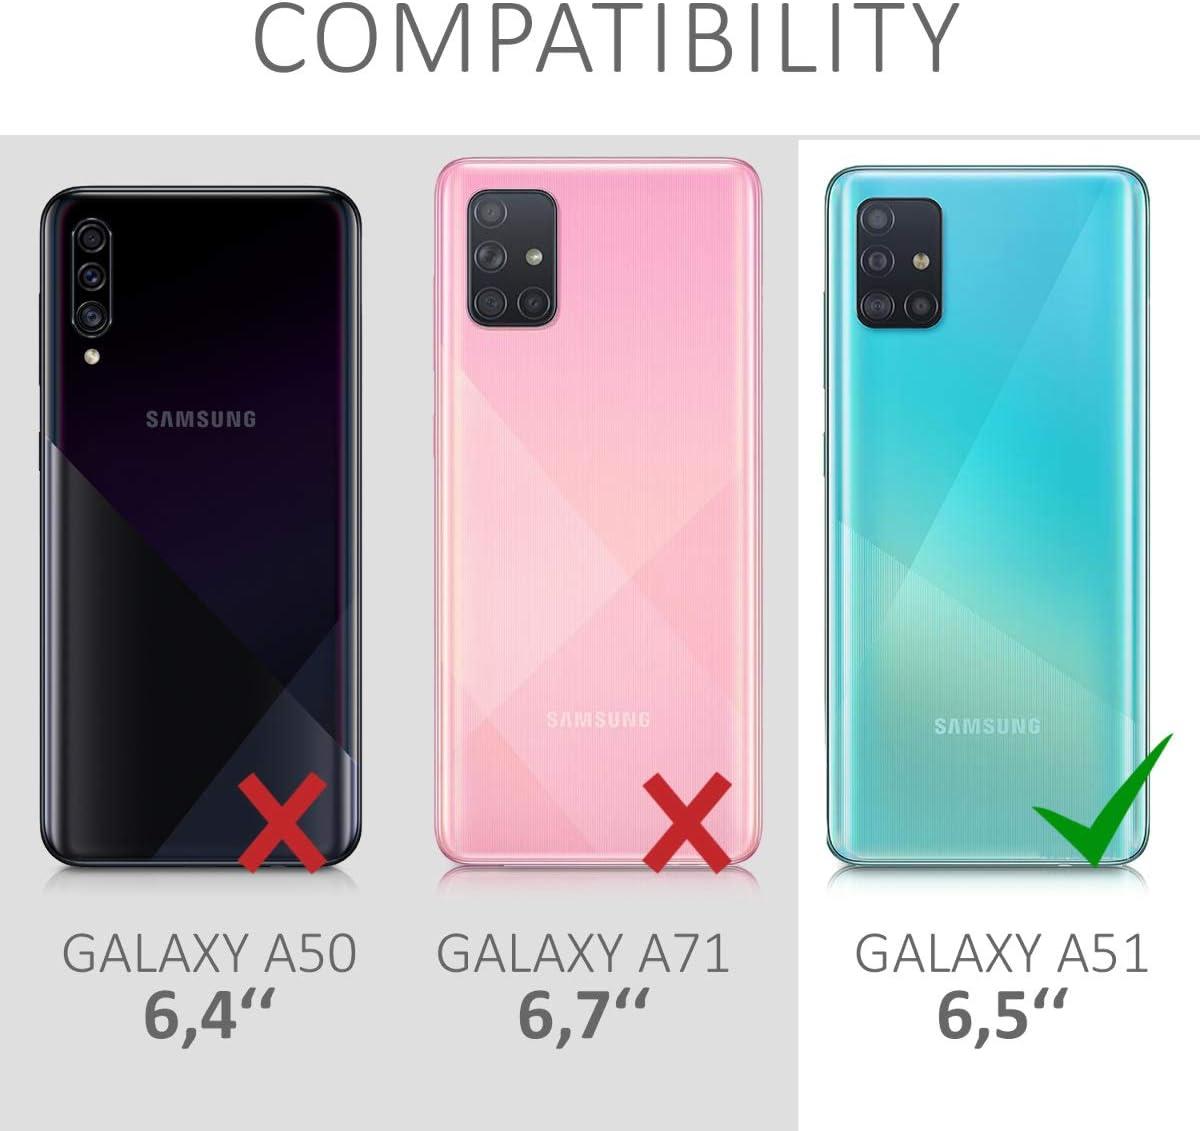 Kompatibel mit Samsung Galaxy S9 Plus H/ülle,Handyh/ülle Galaxy S9 Plus Case Rosa Marmor Muster Ultrad/ünn TPU Silikon H/ülle Schutzh/ülle Crystal Clear Silikon Bumper R/ückschale Case Cover,Design A